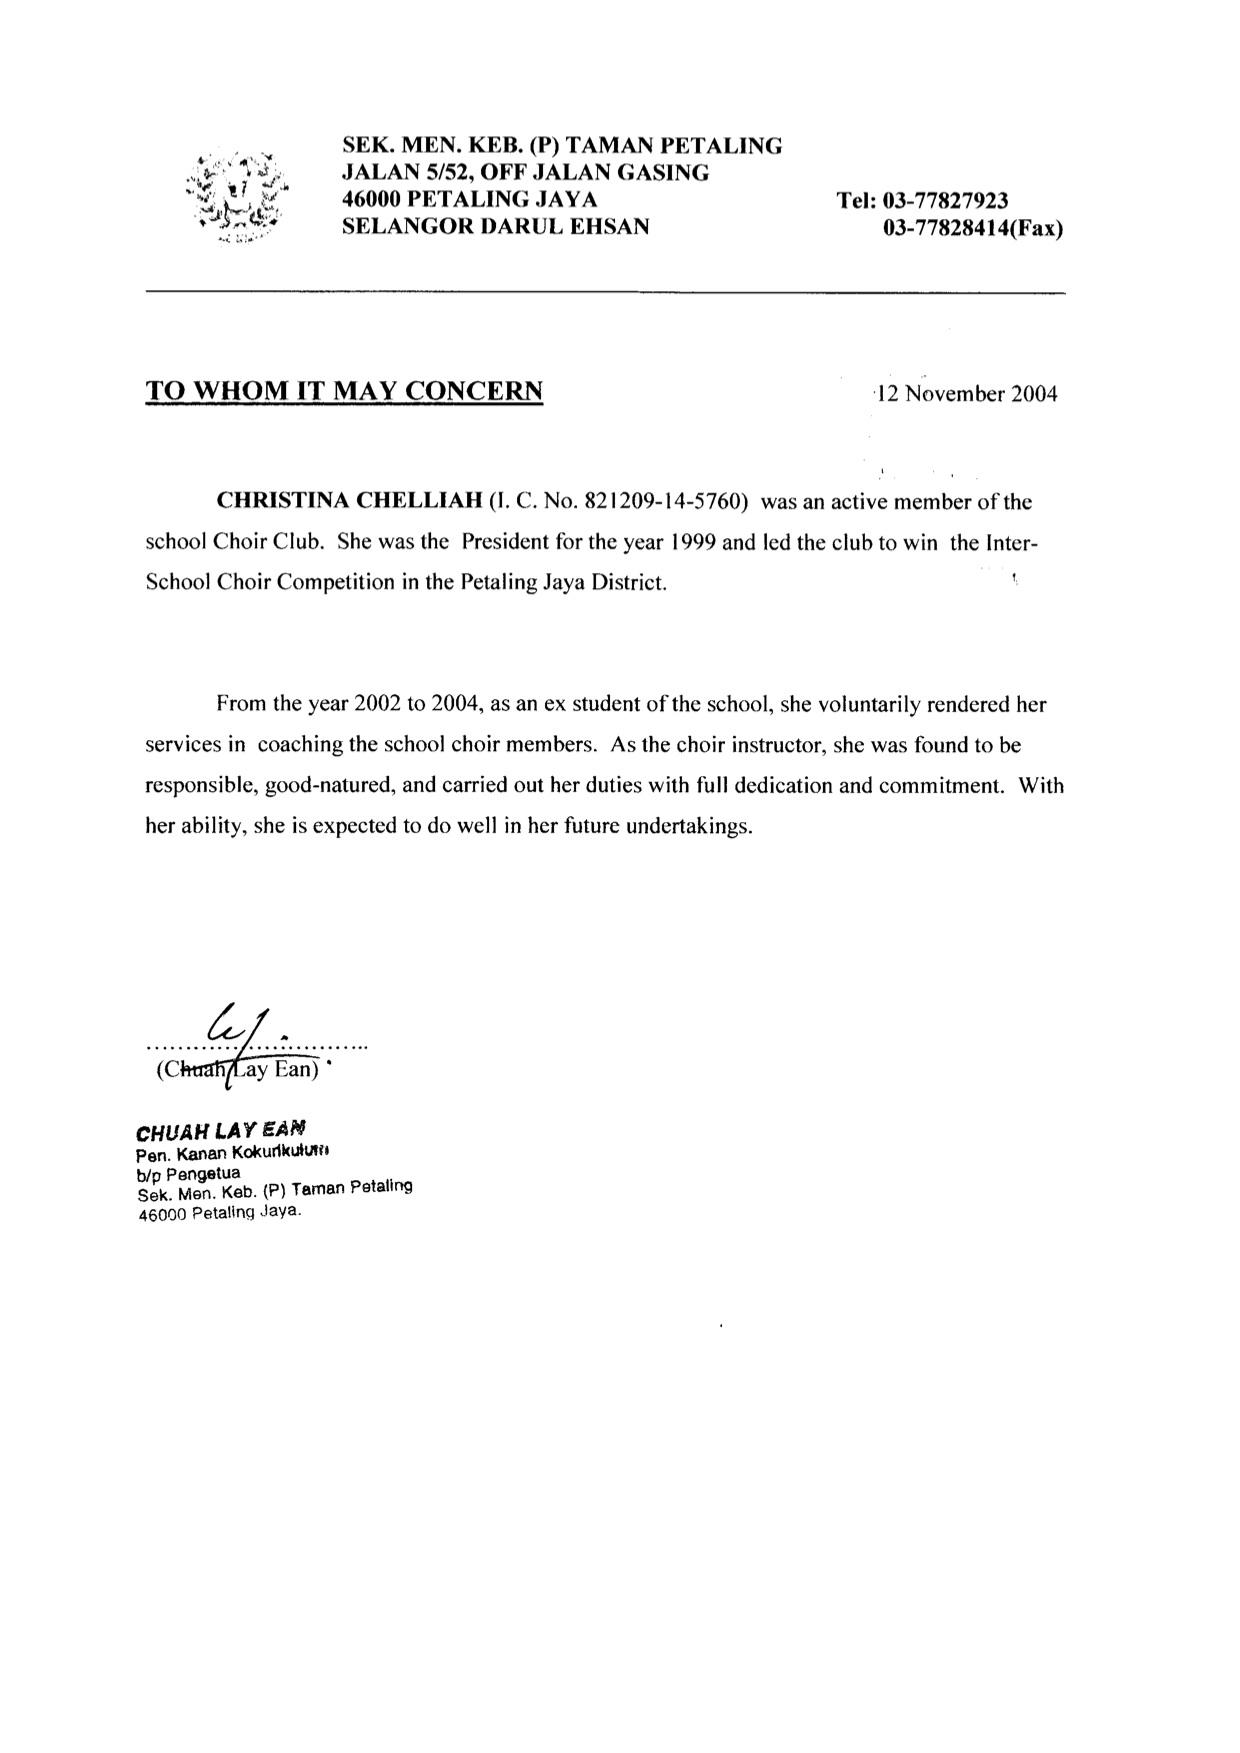 2004 - Misc. - Taman Petaling - Reference Letter.jpg